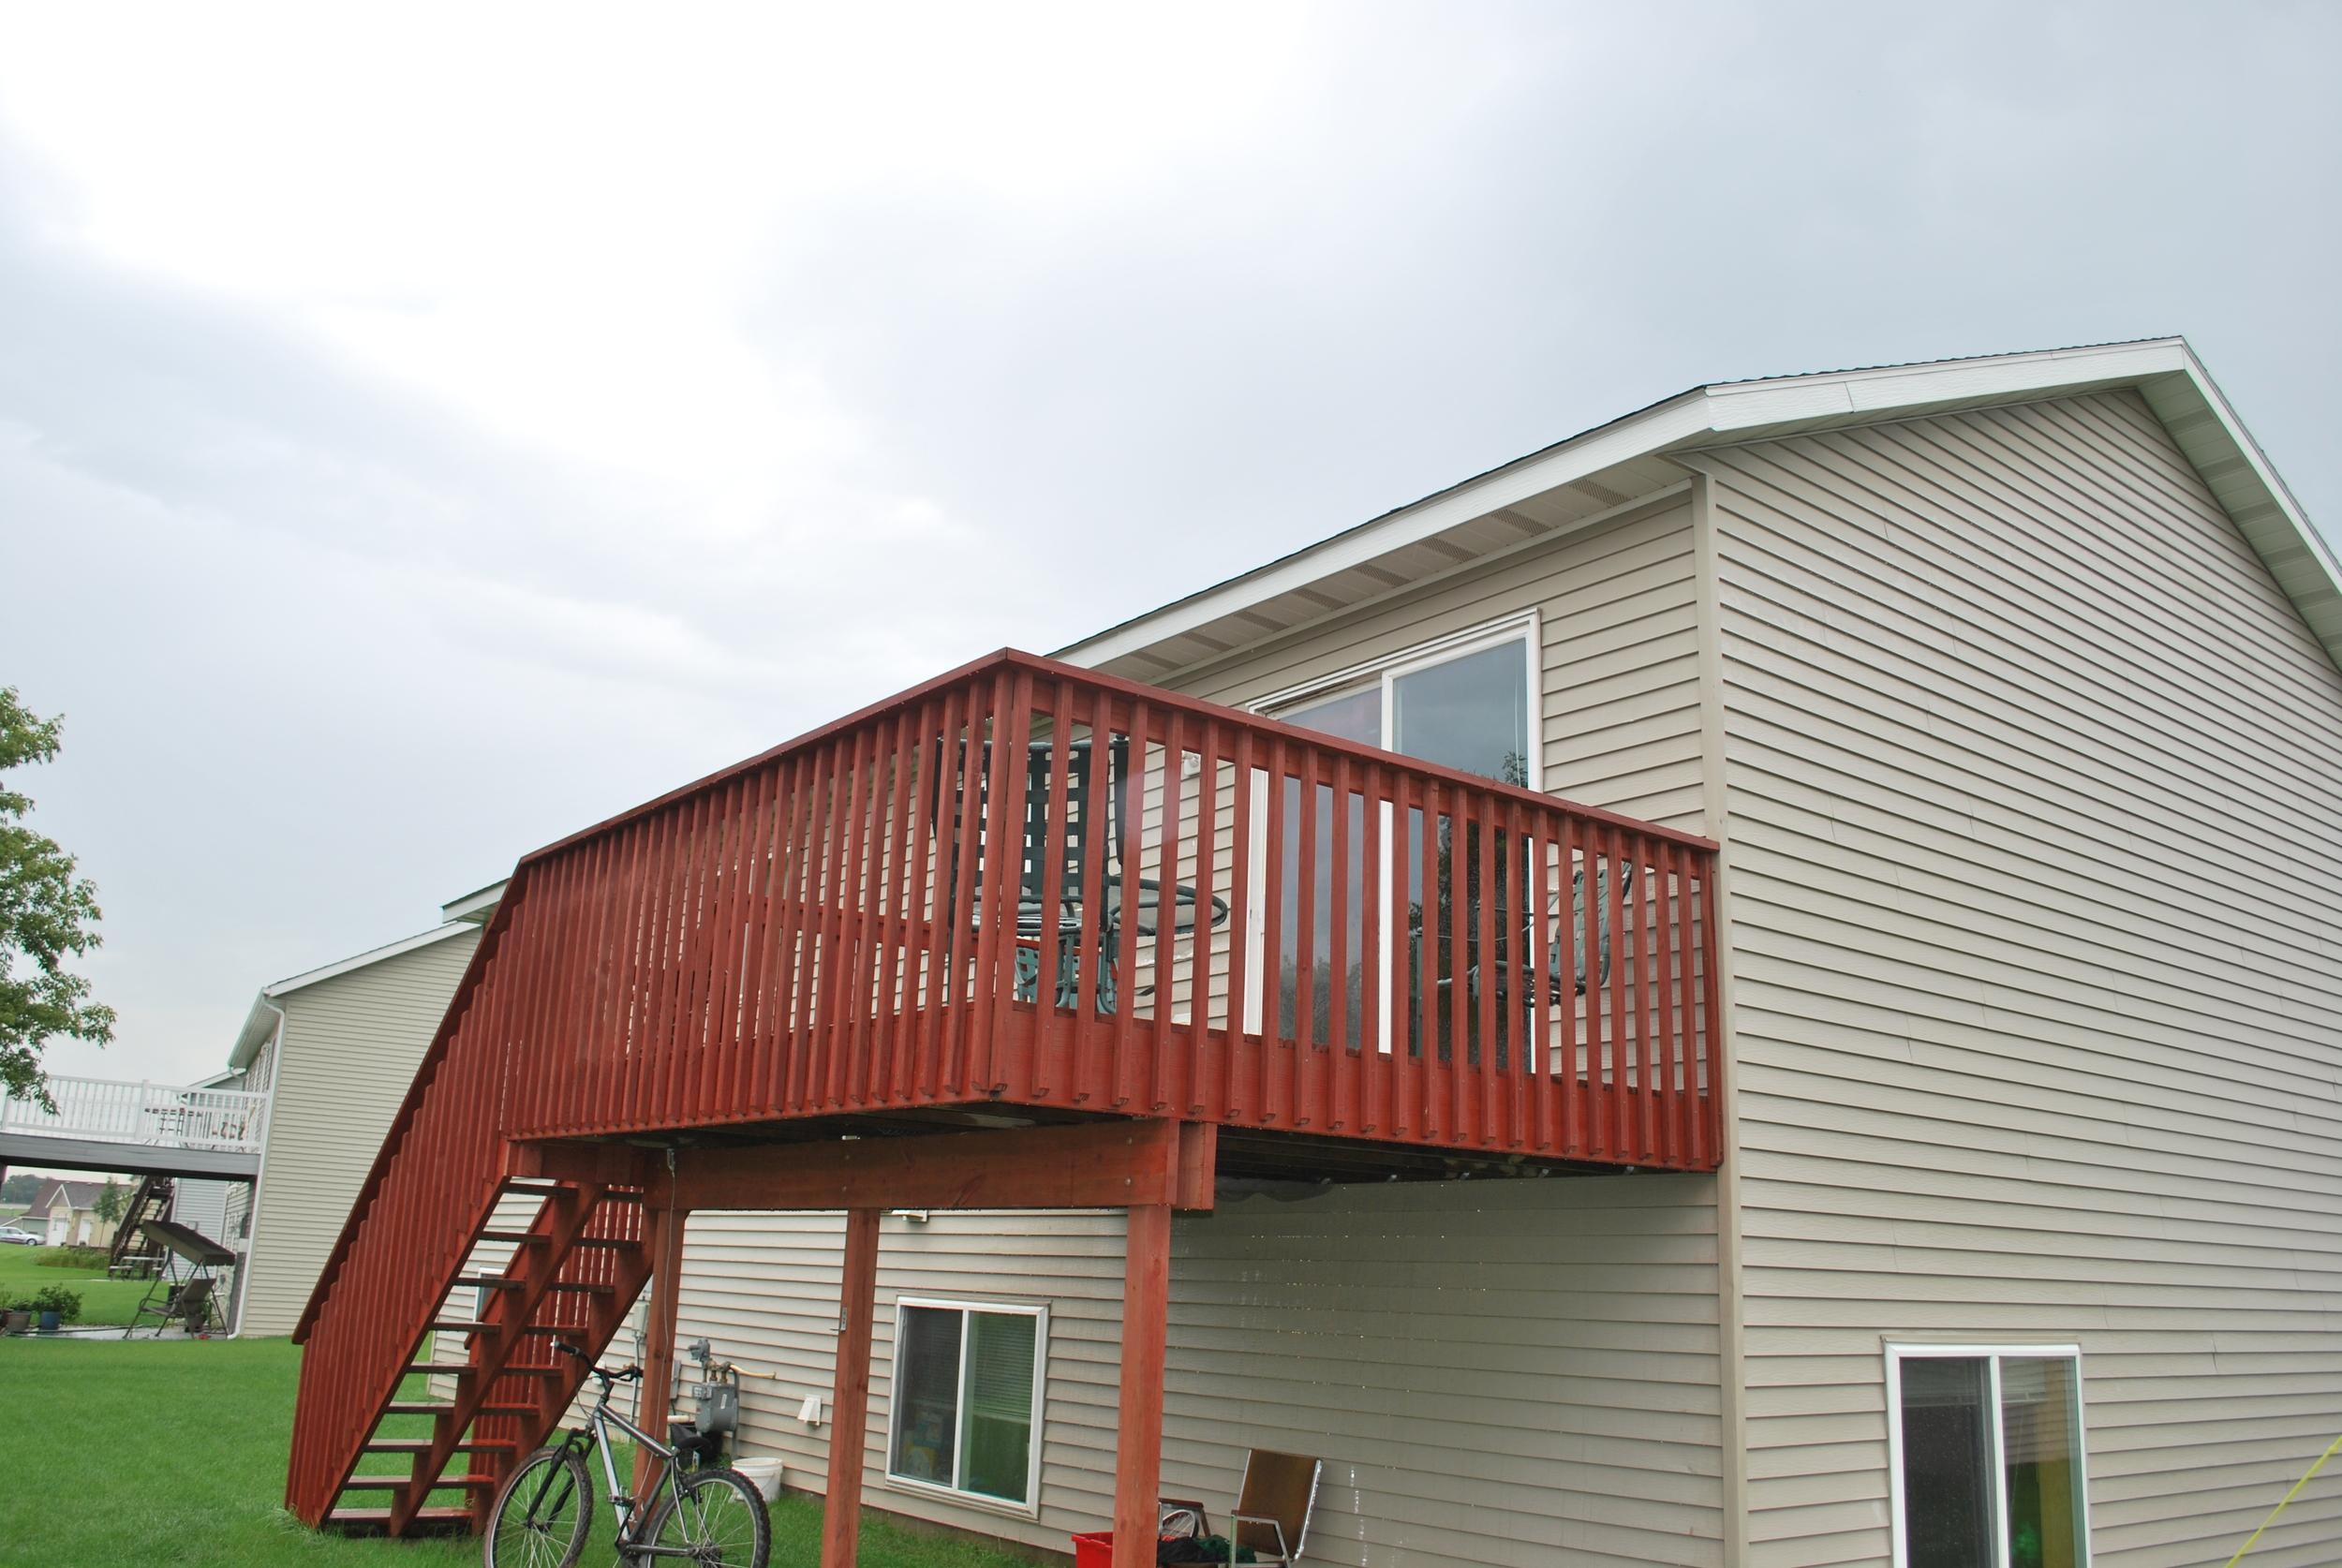 Backyard and Deck - Eastern Star (AFC)